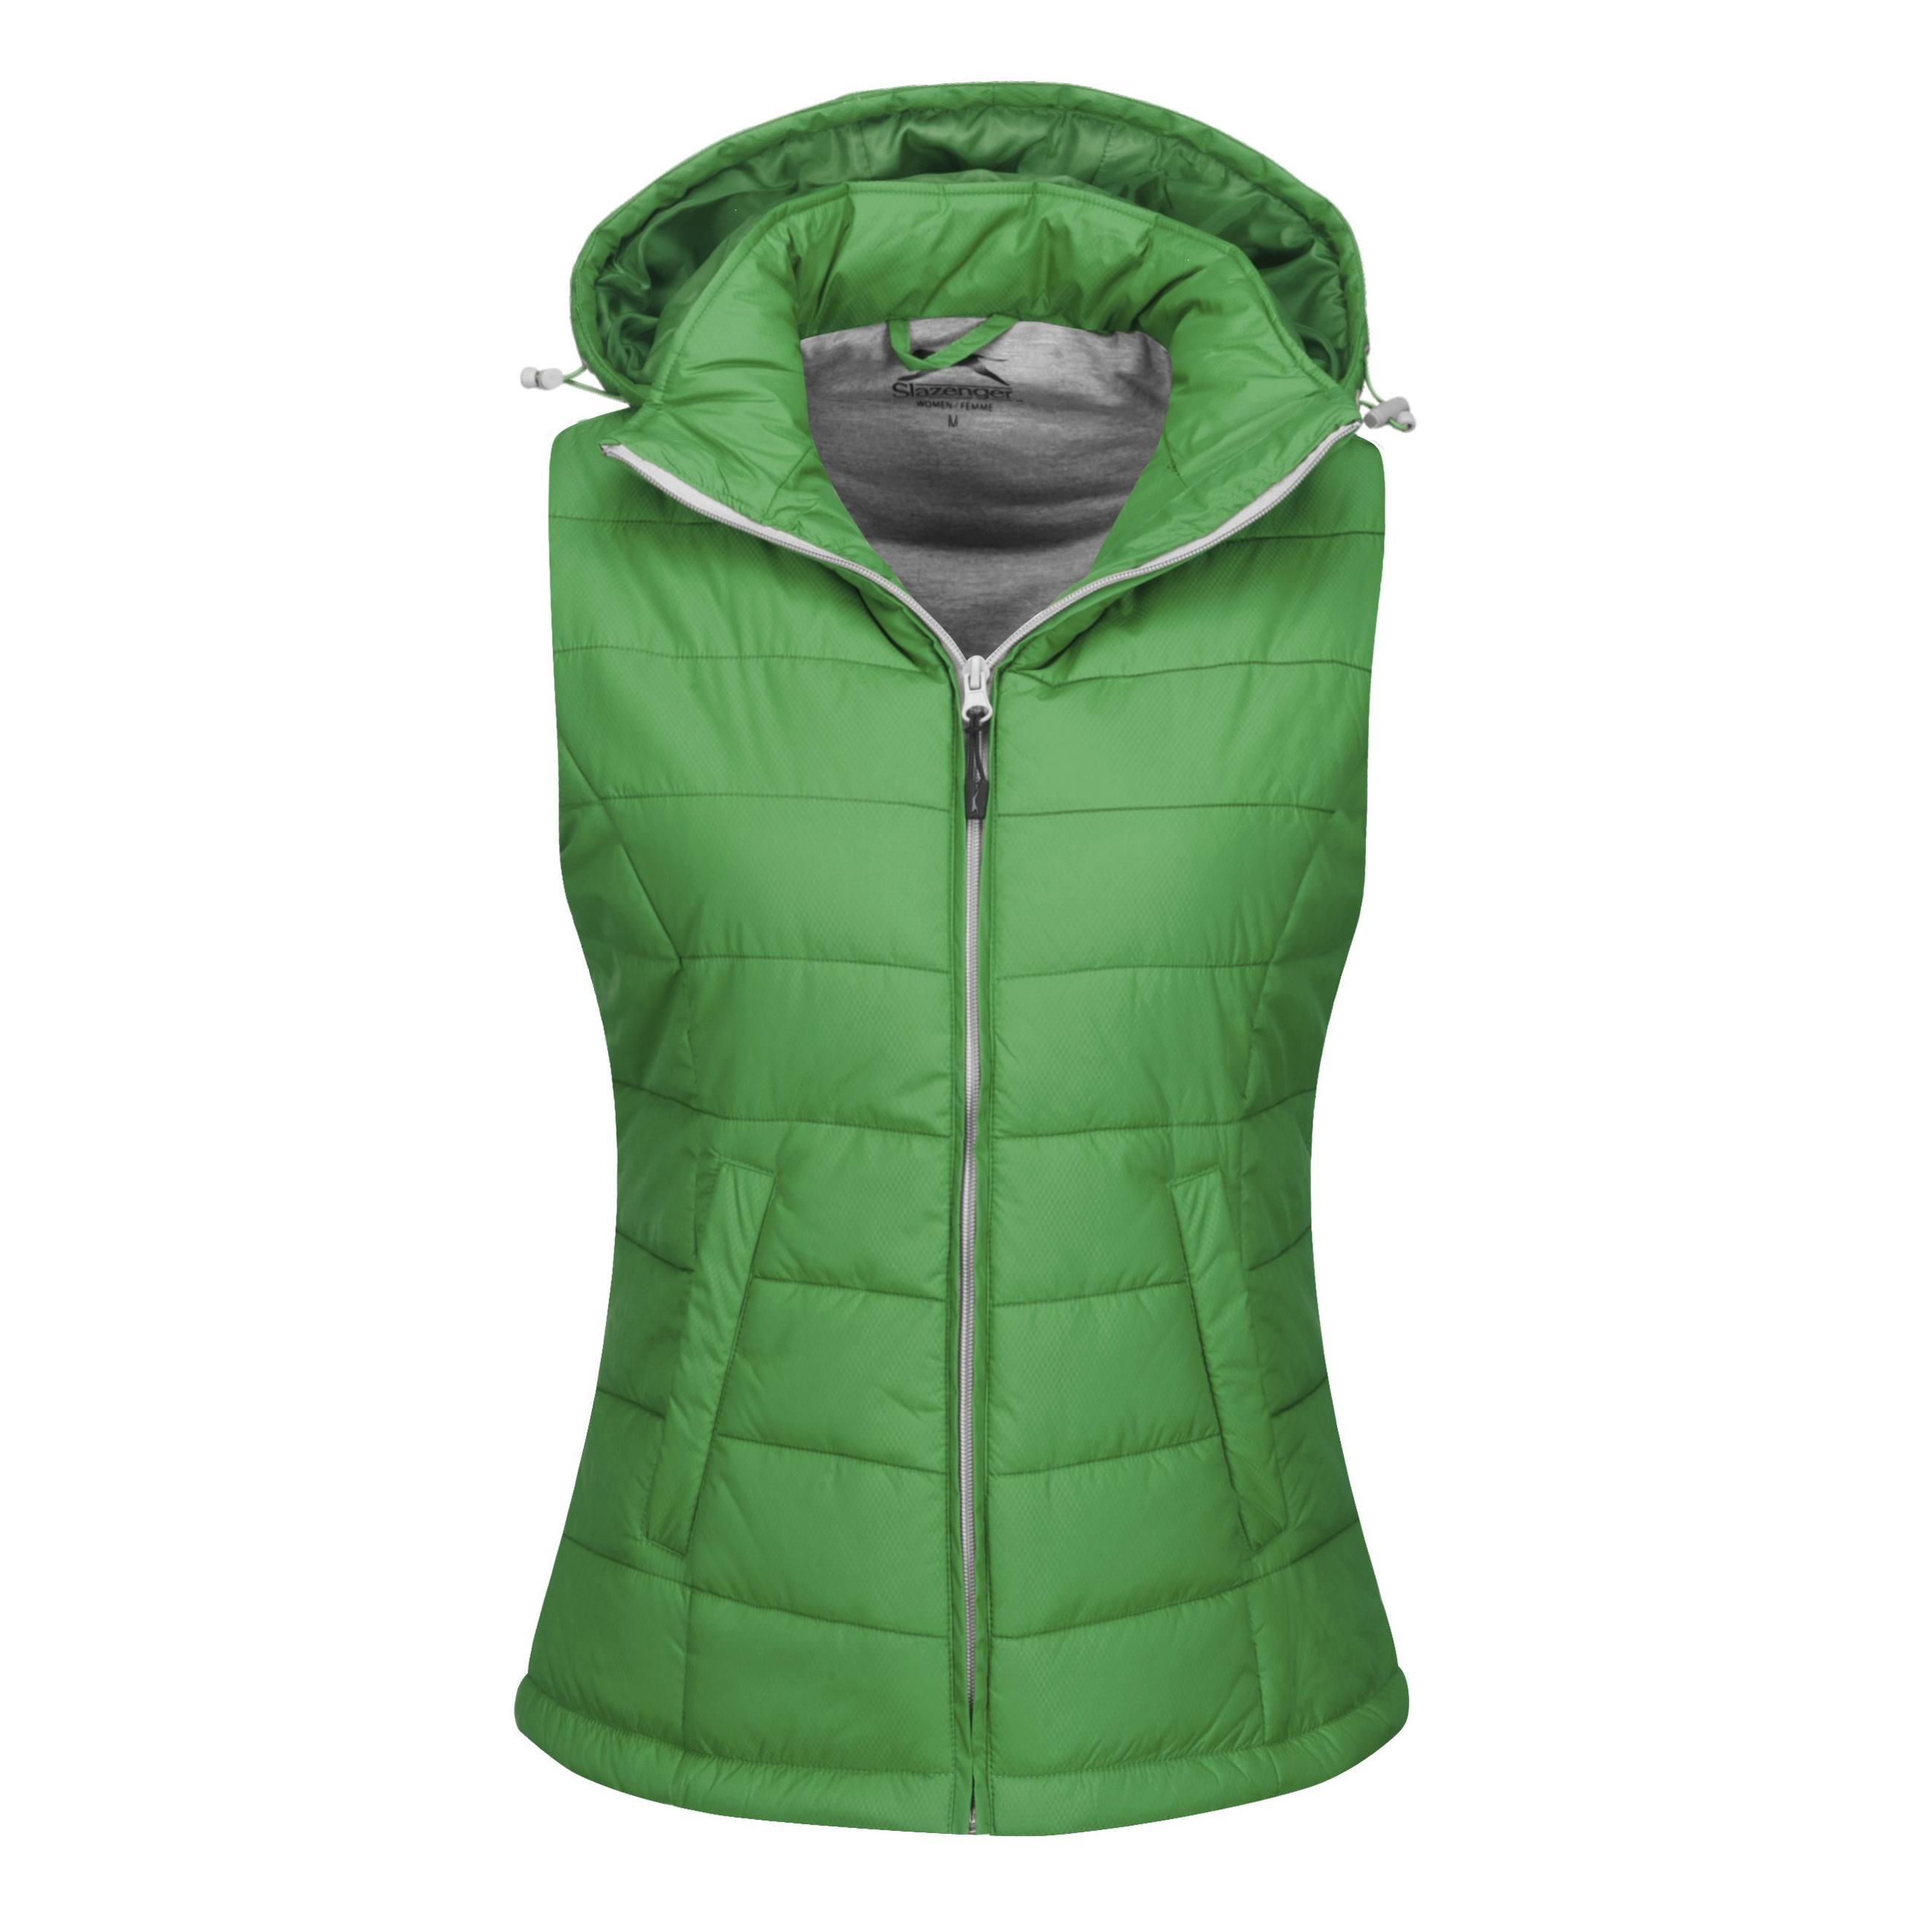 Ladies Evolution Bodywarmer - Green Only